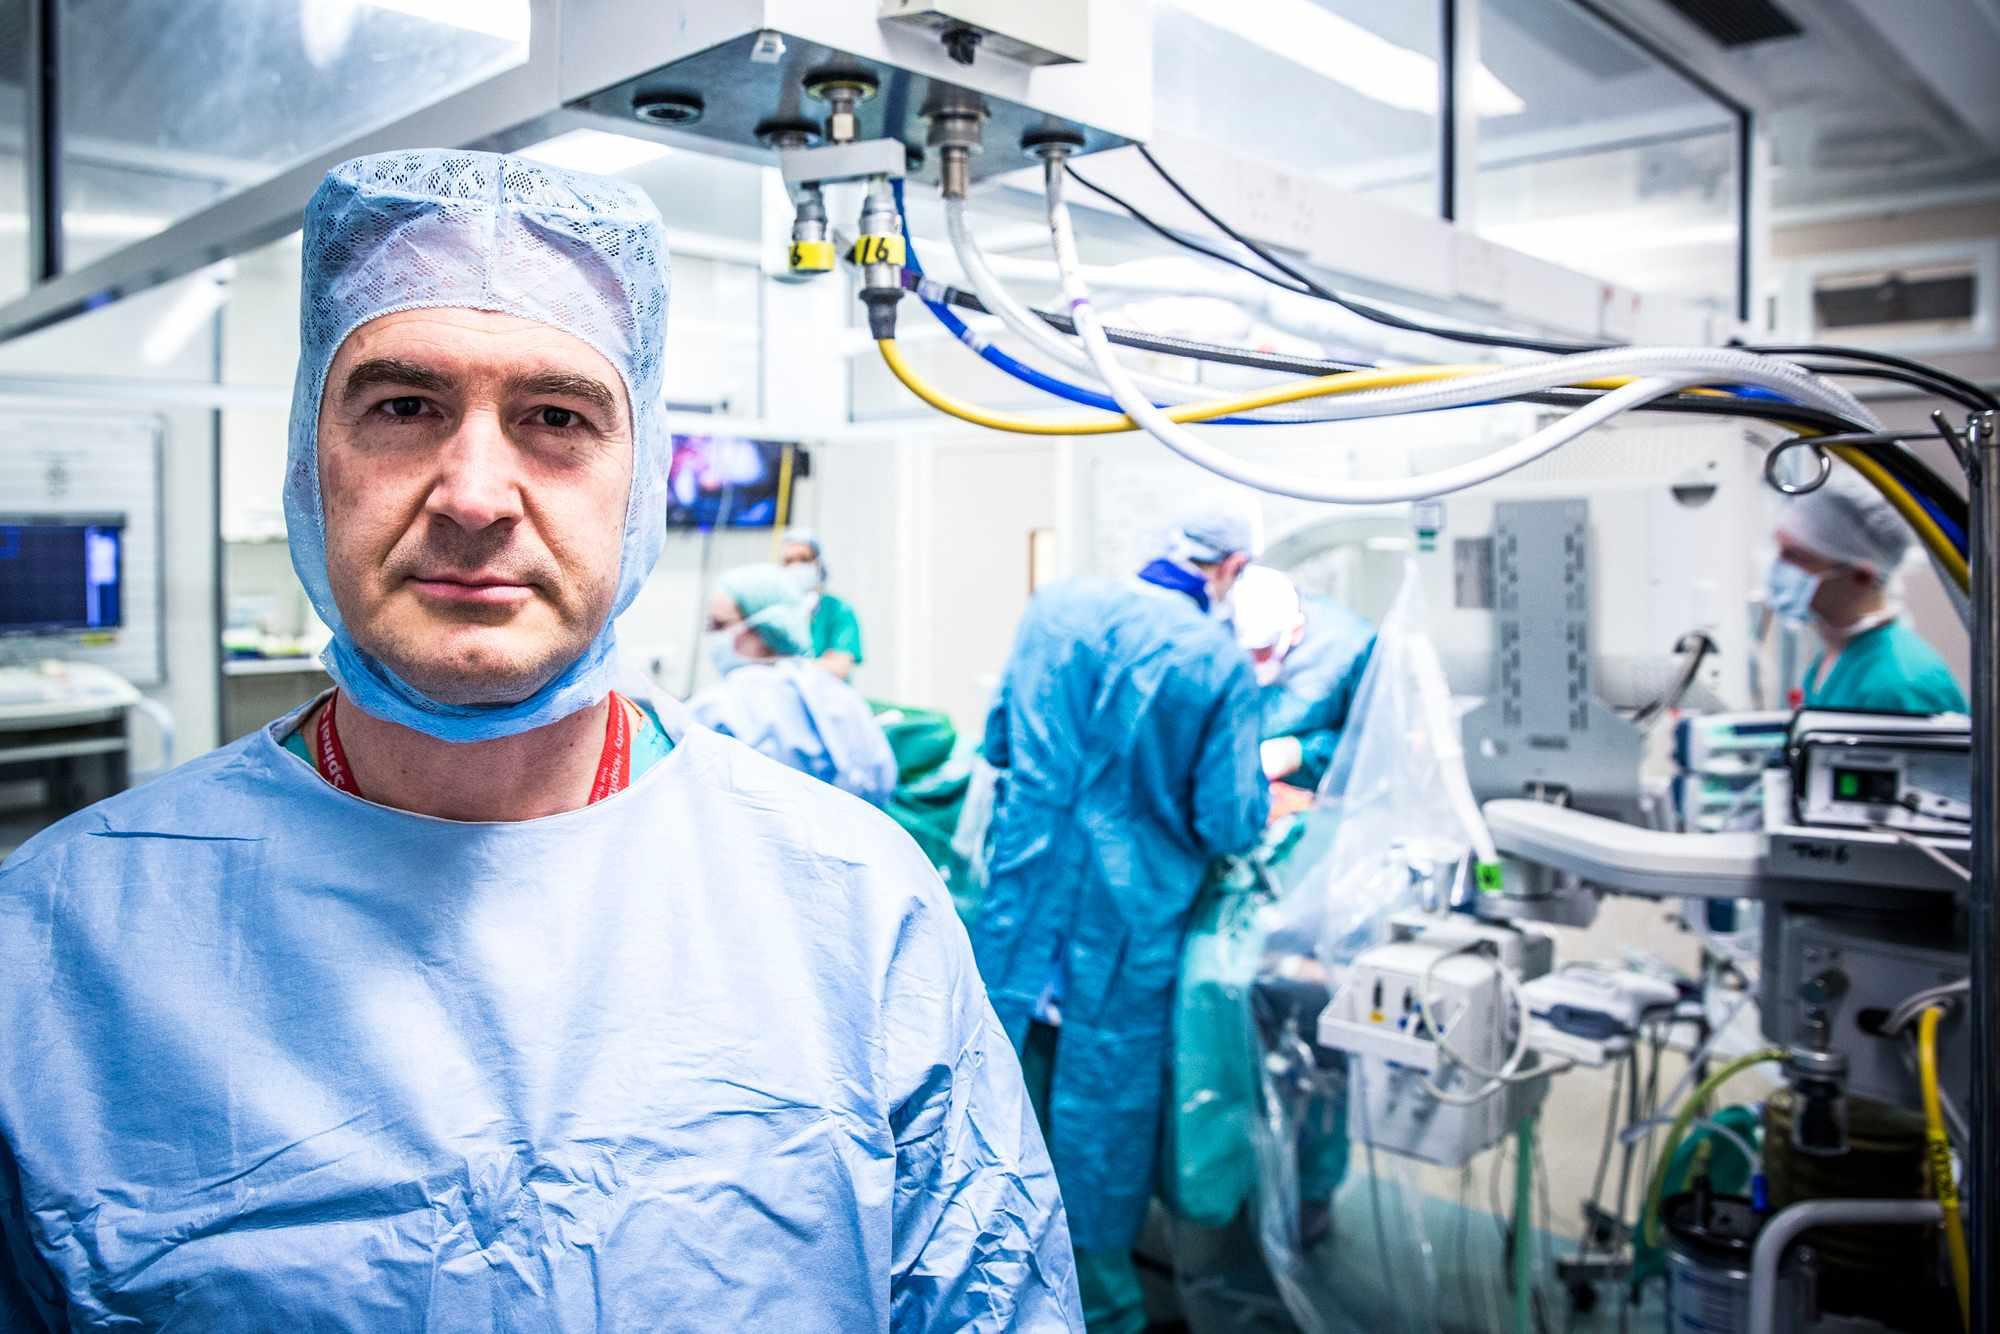 Programme Name: Hospital - TX: n/a - Episode: n/a (No. 6) - Picture Shows:  Bronek Boszczyk - (C) Ryan McNamara - Photographer: Ryan McNamara